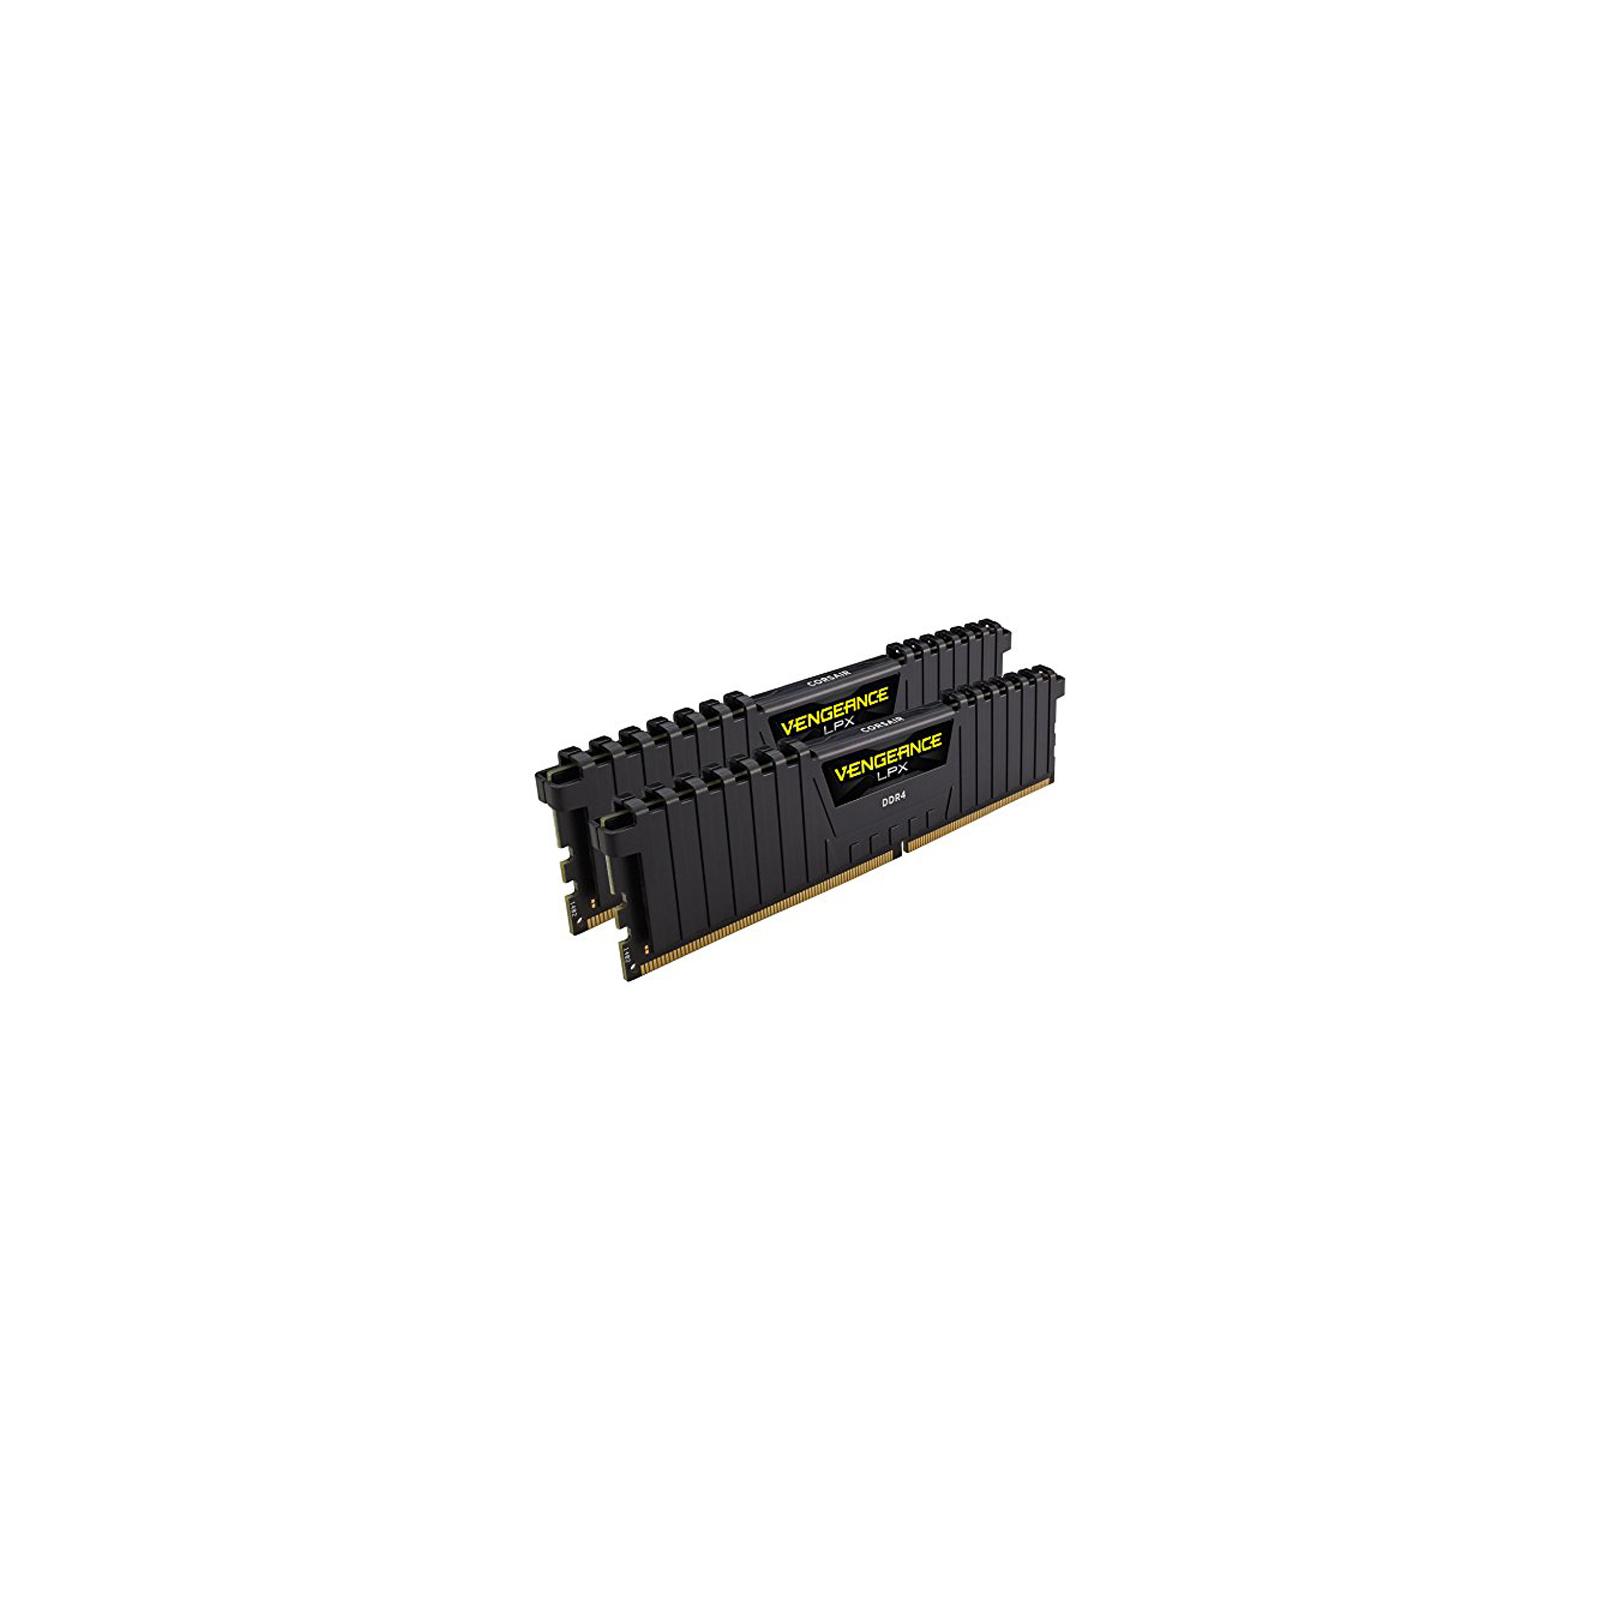 Модуль памяти для компьютера DDR4 16 GB (2x8GB) 2800 MHz Vengeance LPX Black CORSAIR (CMK16GX4M2B2800C14) изображение 3